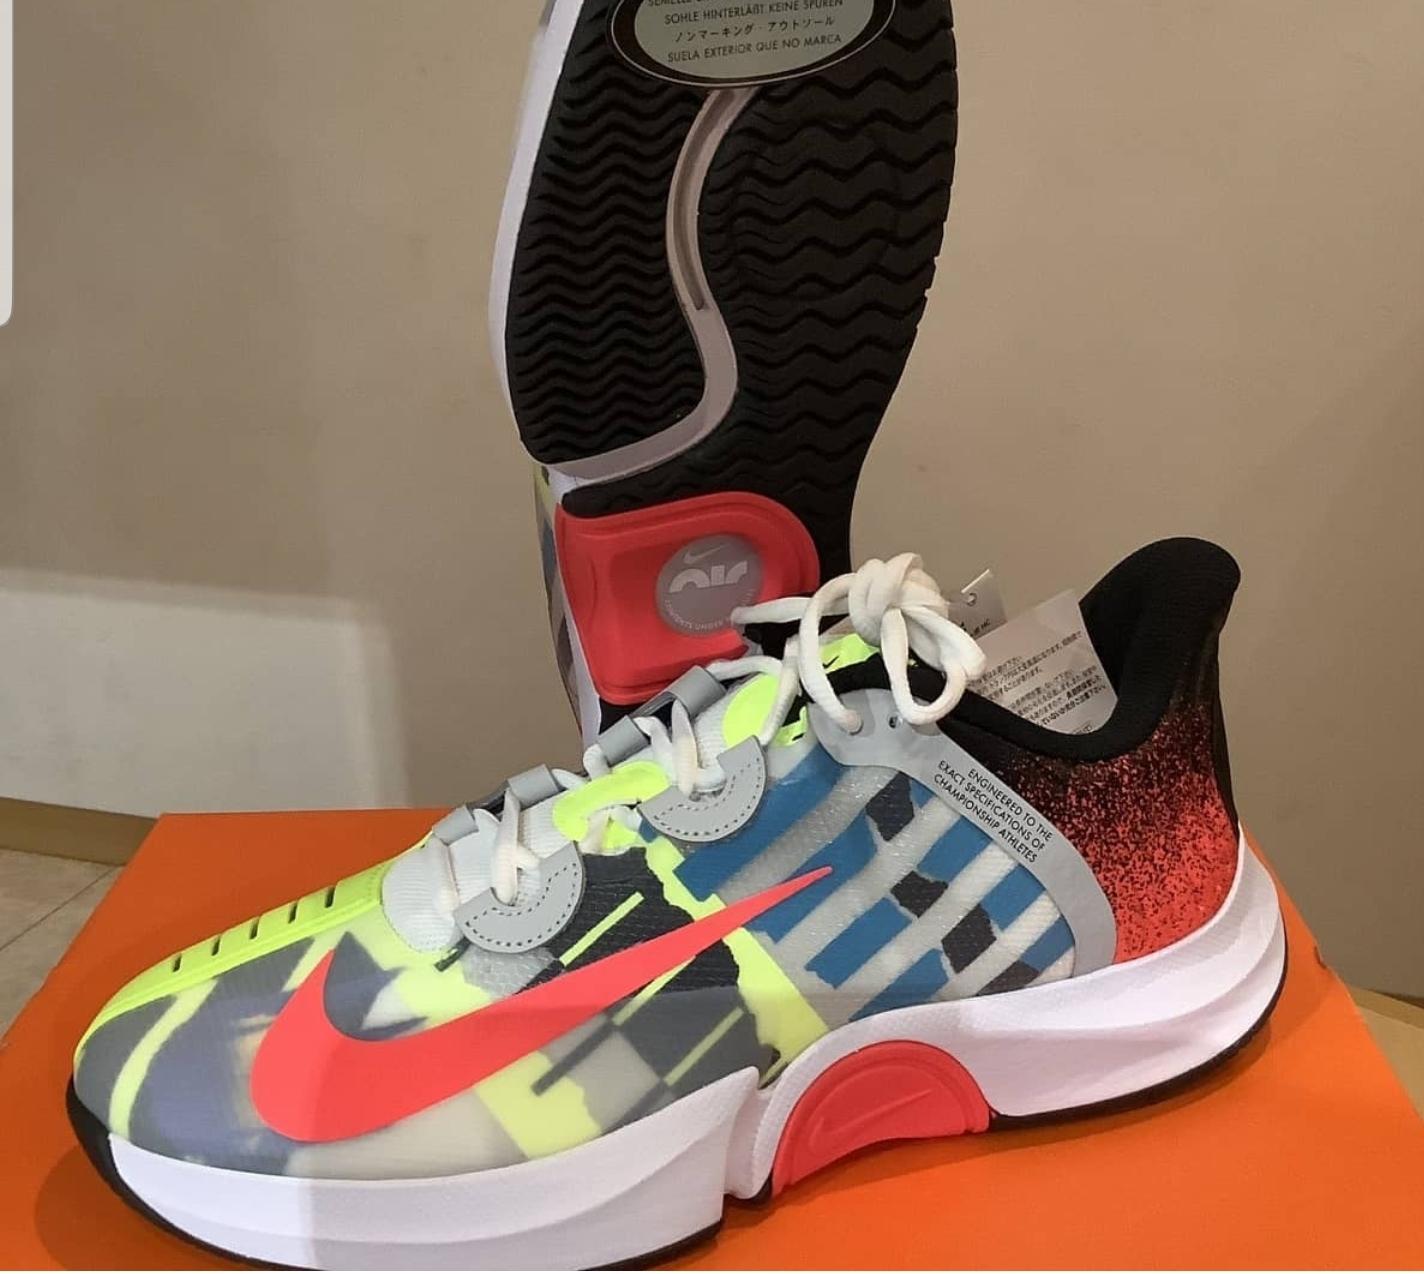 Arreglo malicioso Anormal  Nike Zoom Turbo GP for US Open 2020 - LOVE TENNIS Blog